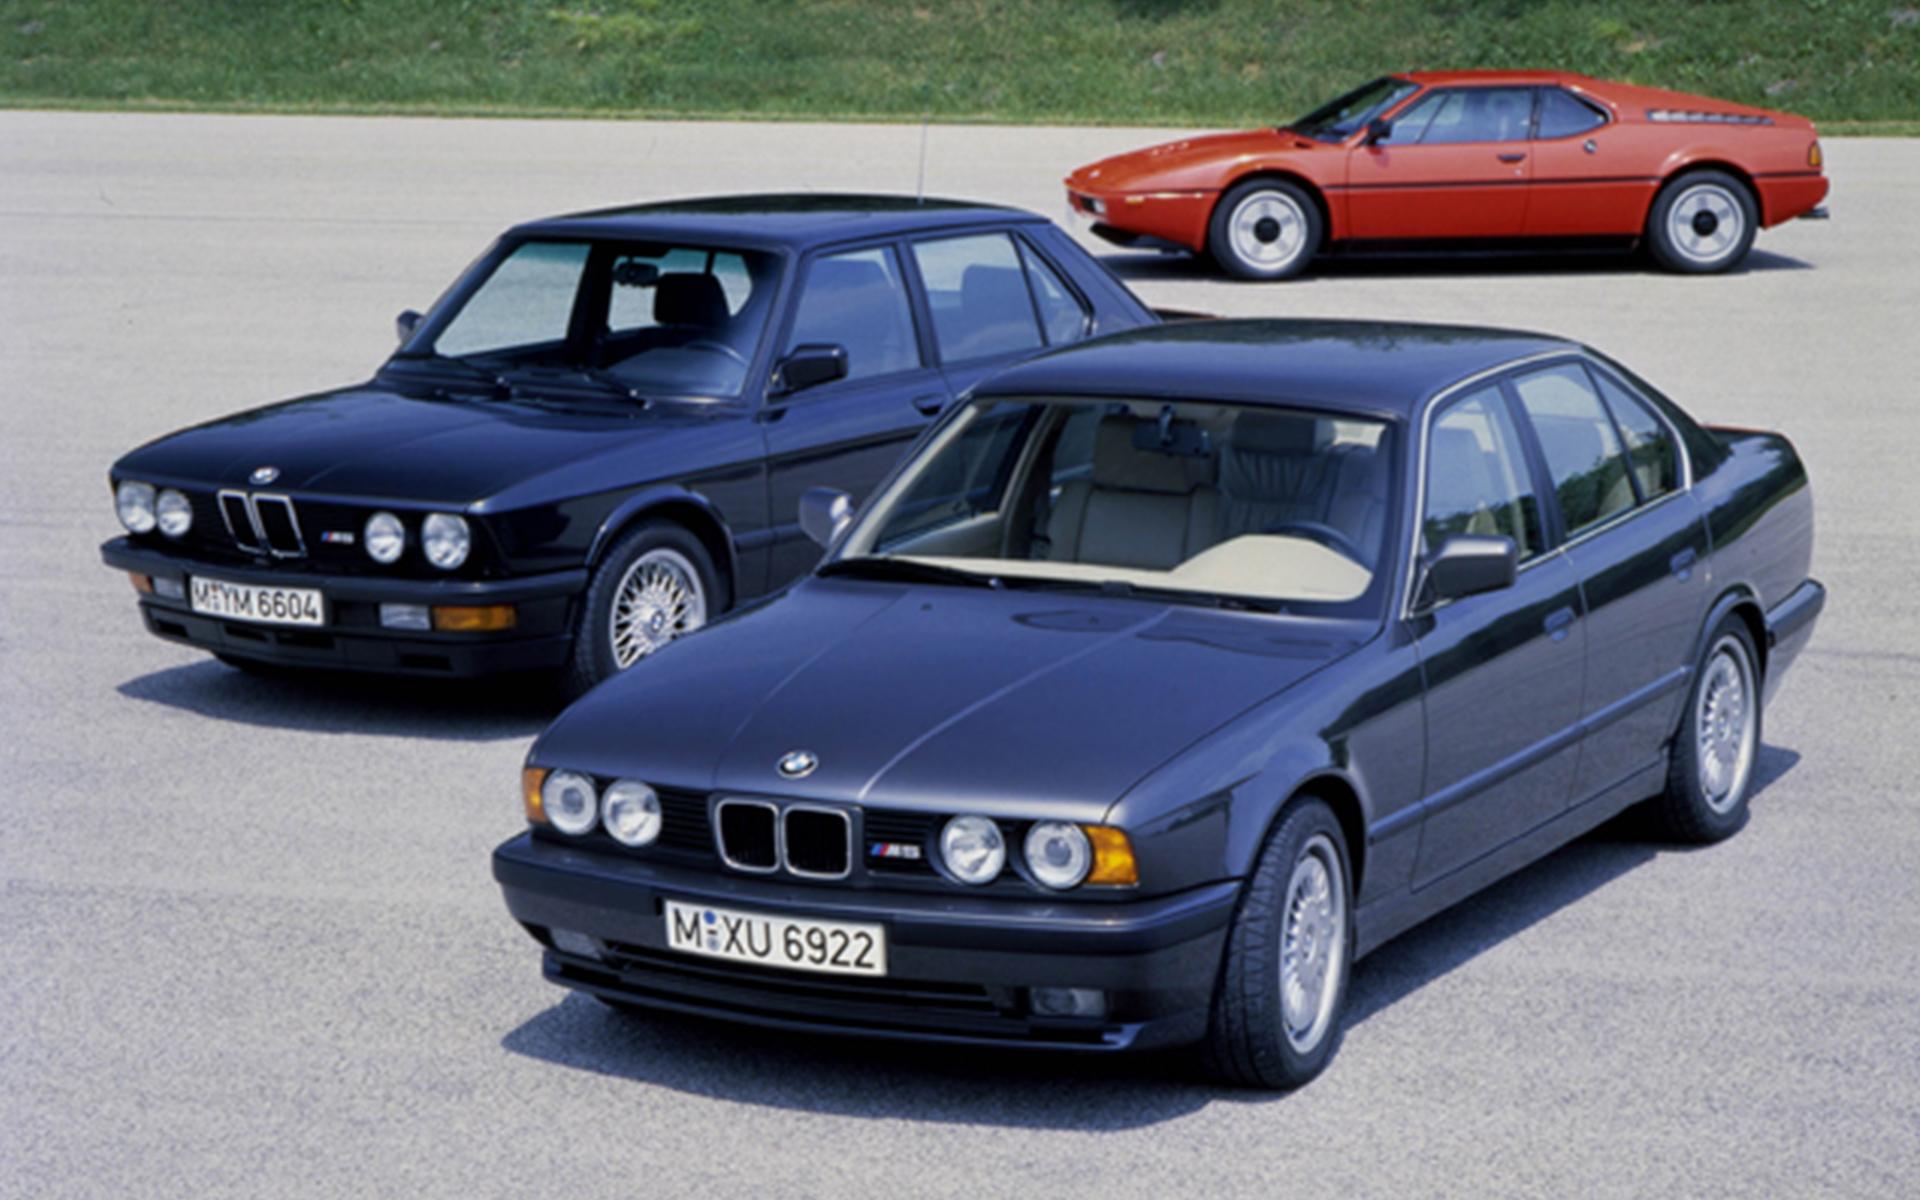 Bmw m5 of 1988 2nd generation bmw m1 bmw m3 of 1986